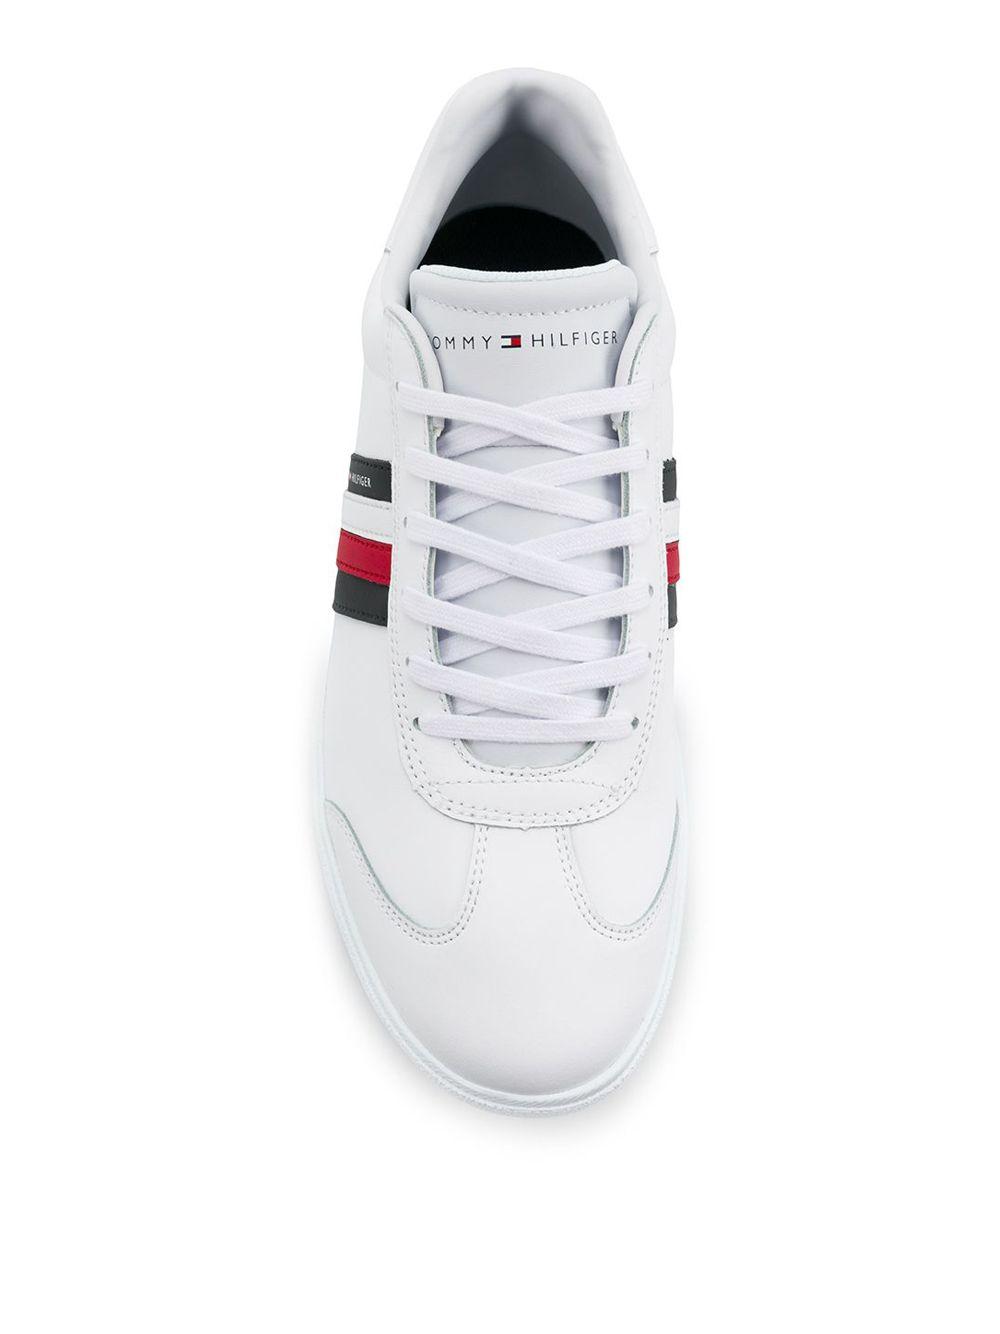 TOMMY HILFIGER | кроссовки с полосками | Clouty